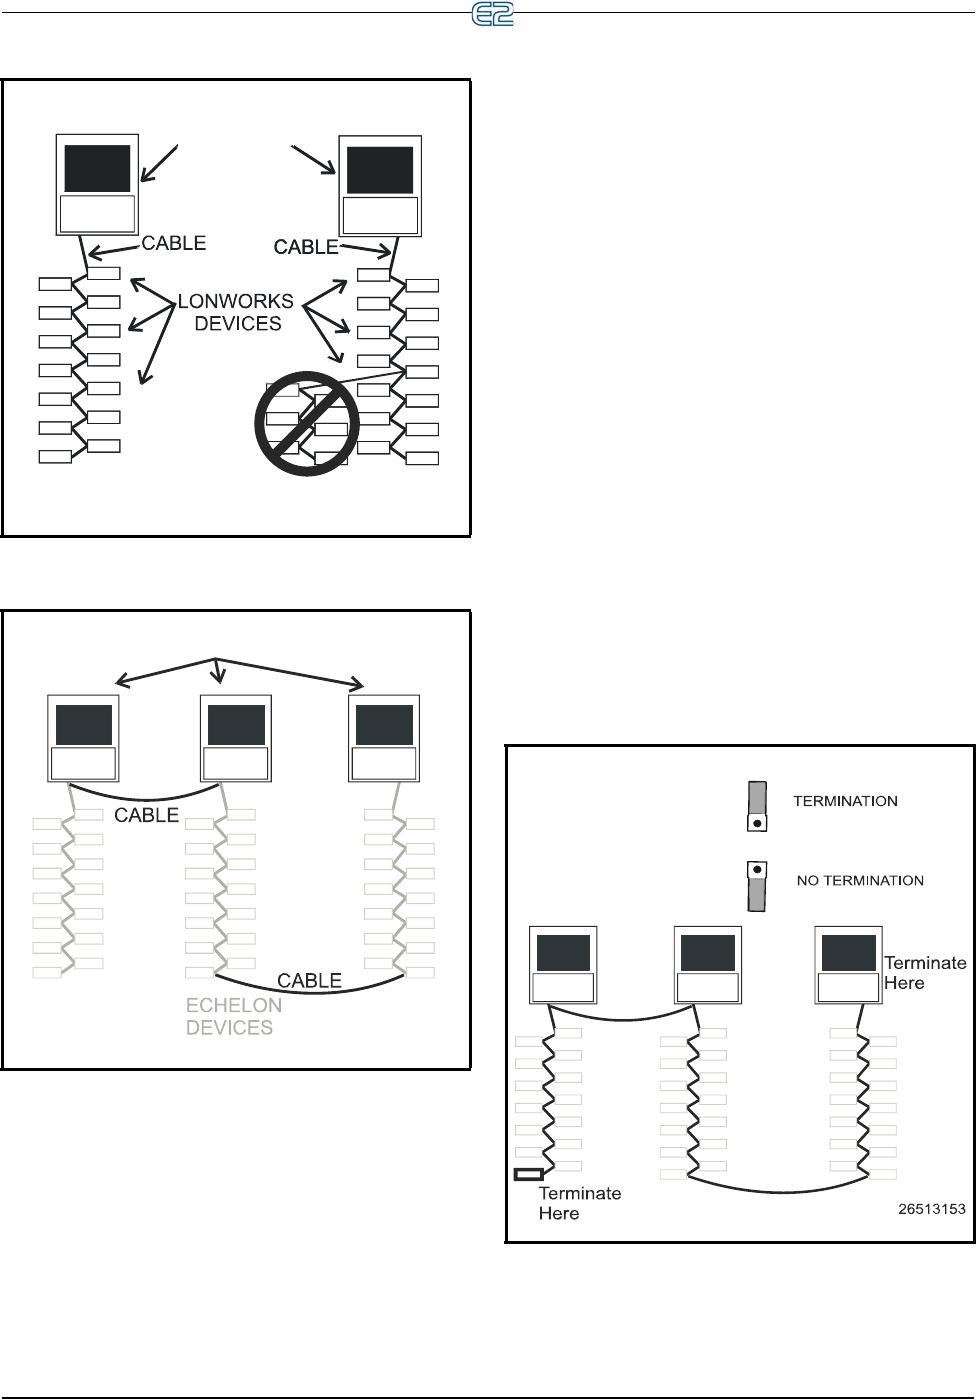 Emerson E2 Users Manual E3 Motor Pwm Speed Control Circuit Controlcircuit Diagram Figure 8 1 Echelon Wiring Subnets